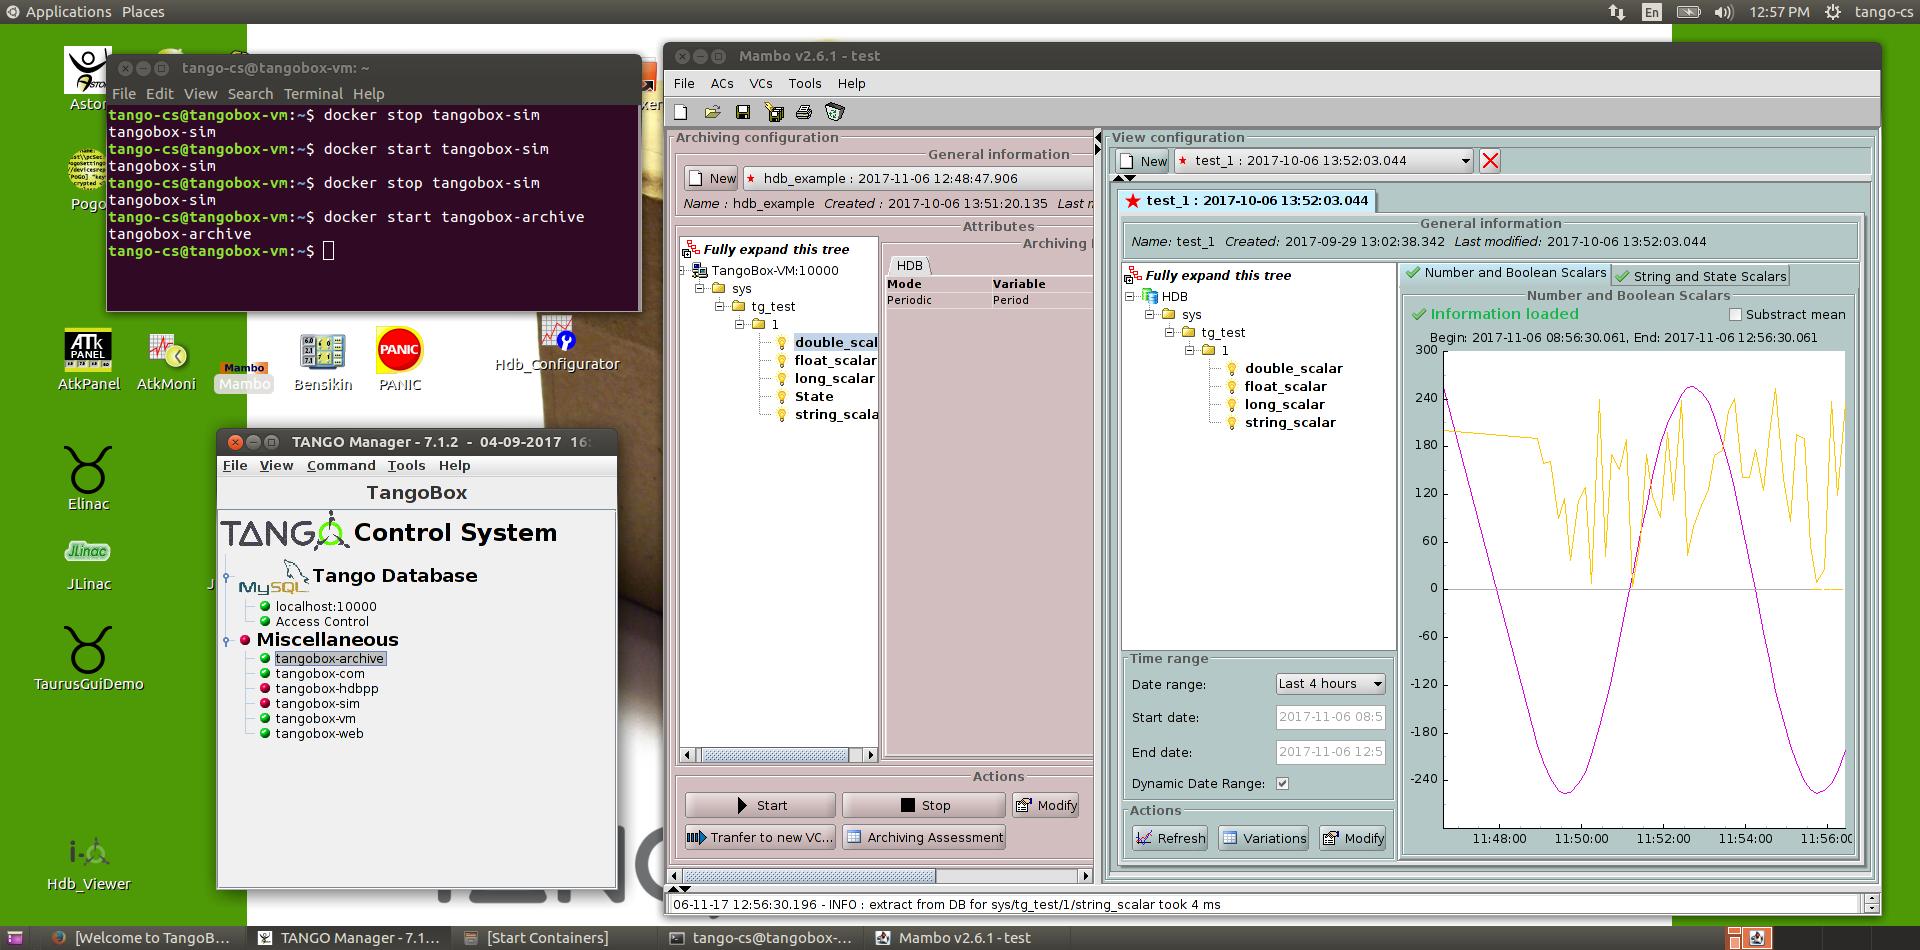 TangoBox 9 2 — Tango Controls 9 3 3 documentation